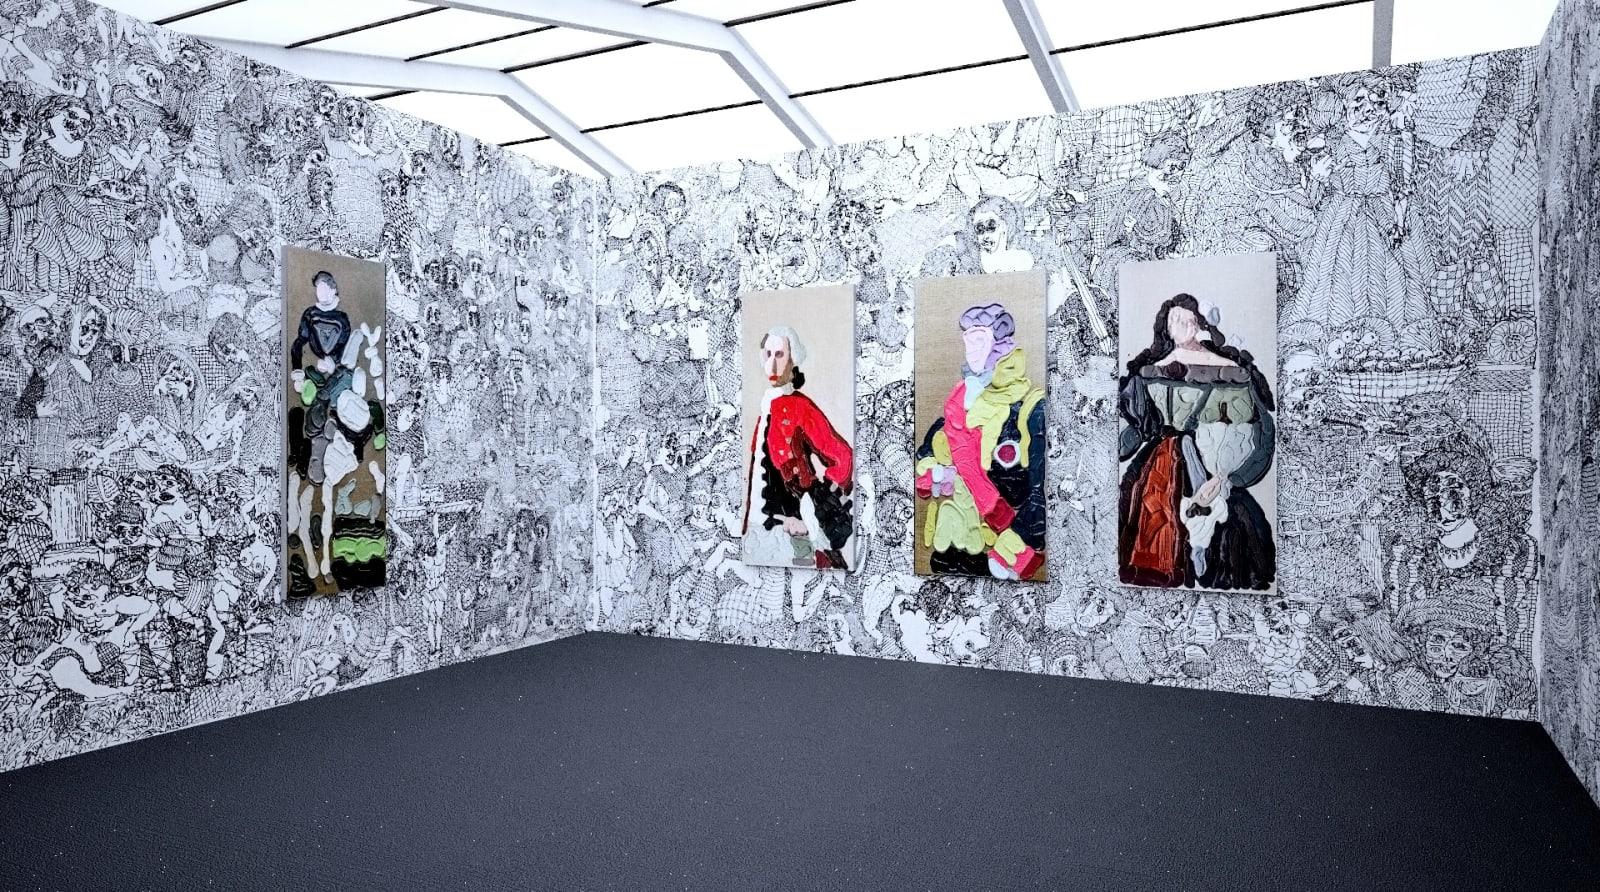 Works by José Lerma at Frieze New York (Installation View), Kavi Gupta, 2020